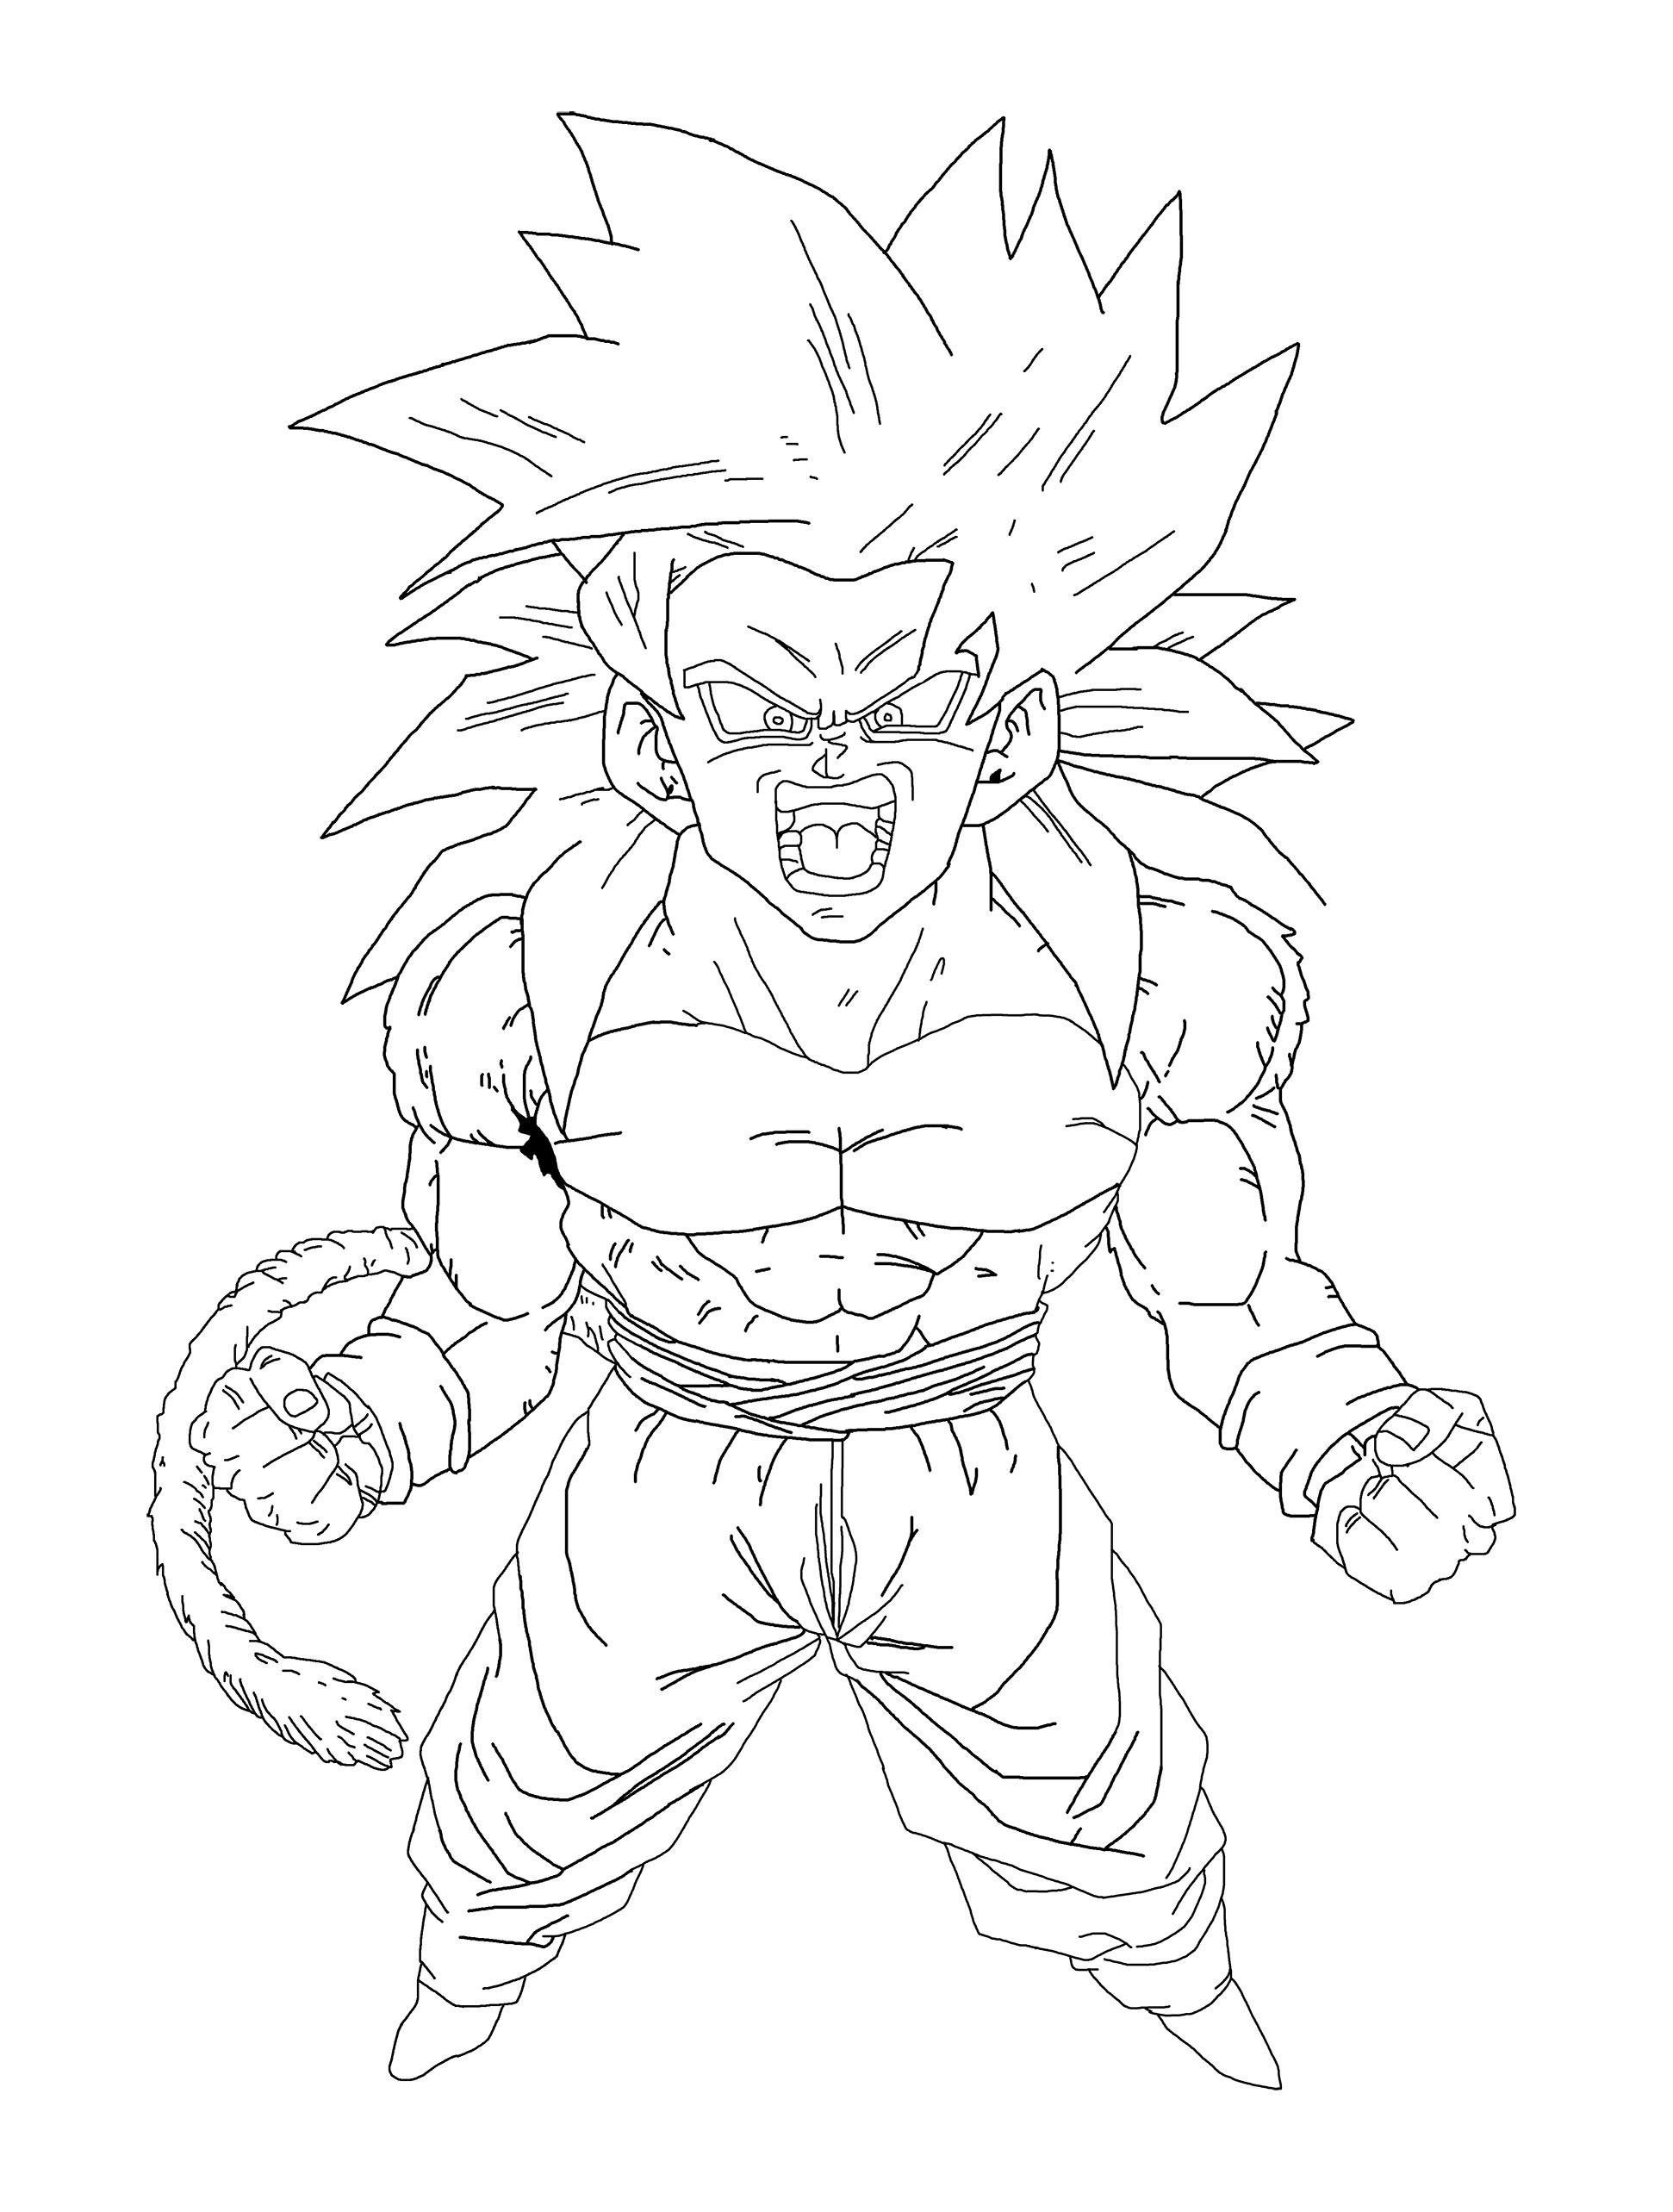 Line Art of a raging Super Saiyan 4 Goku by ...